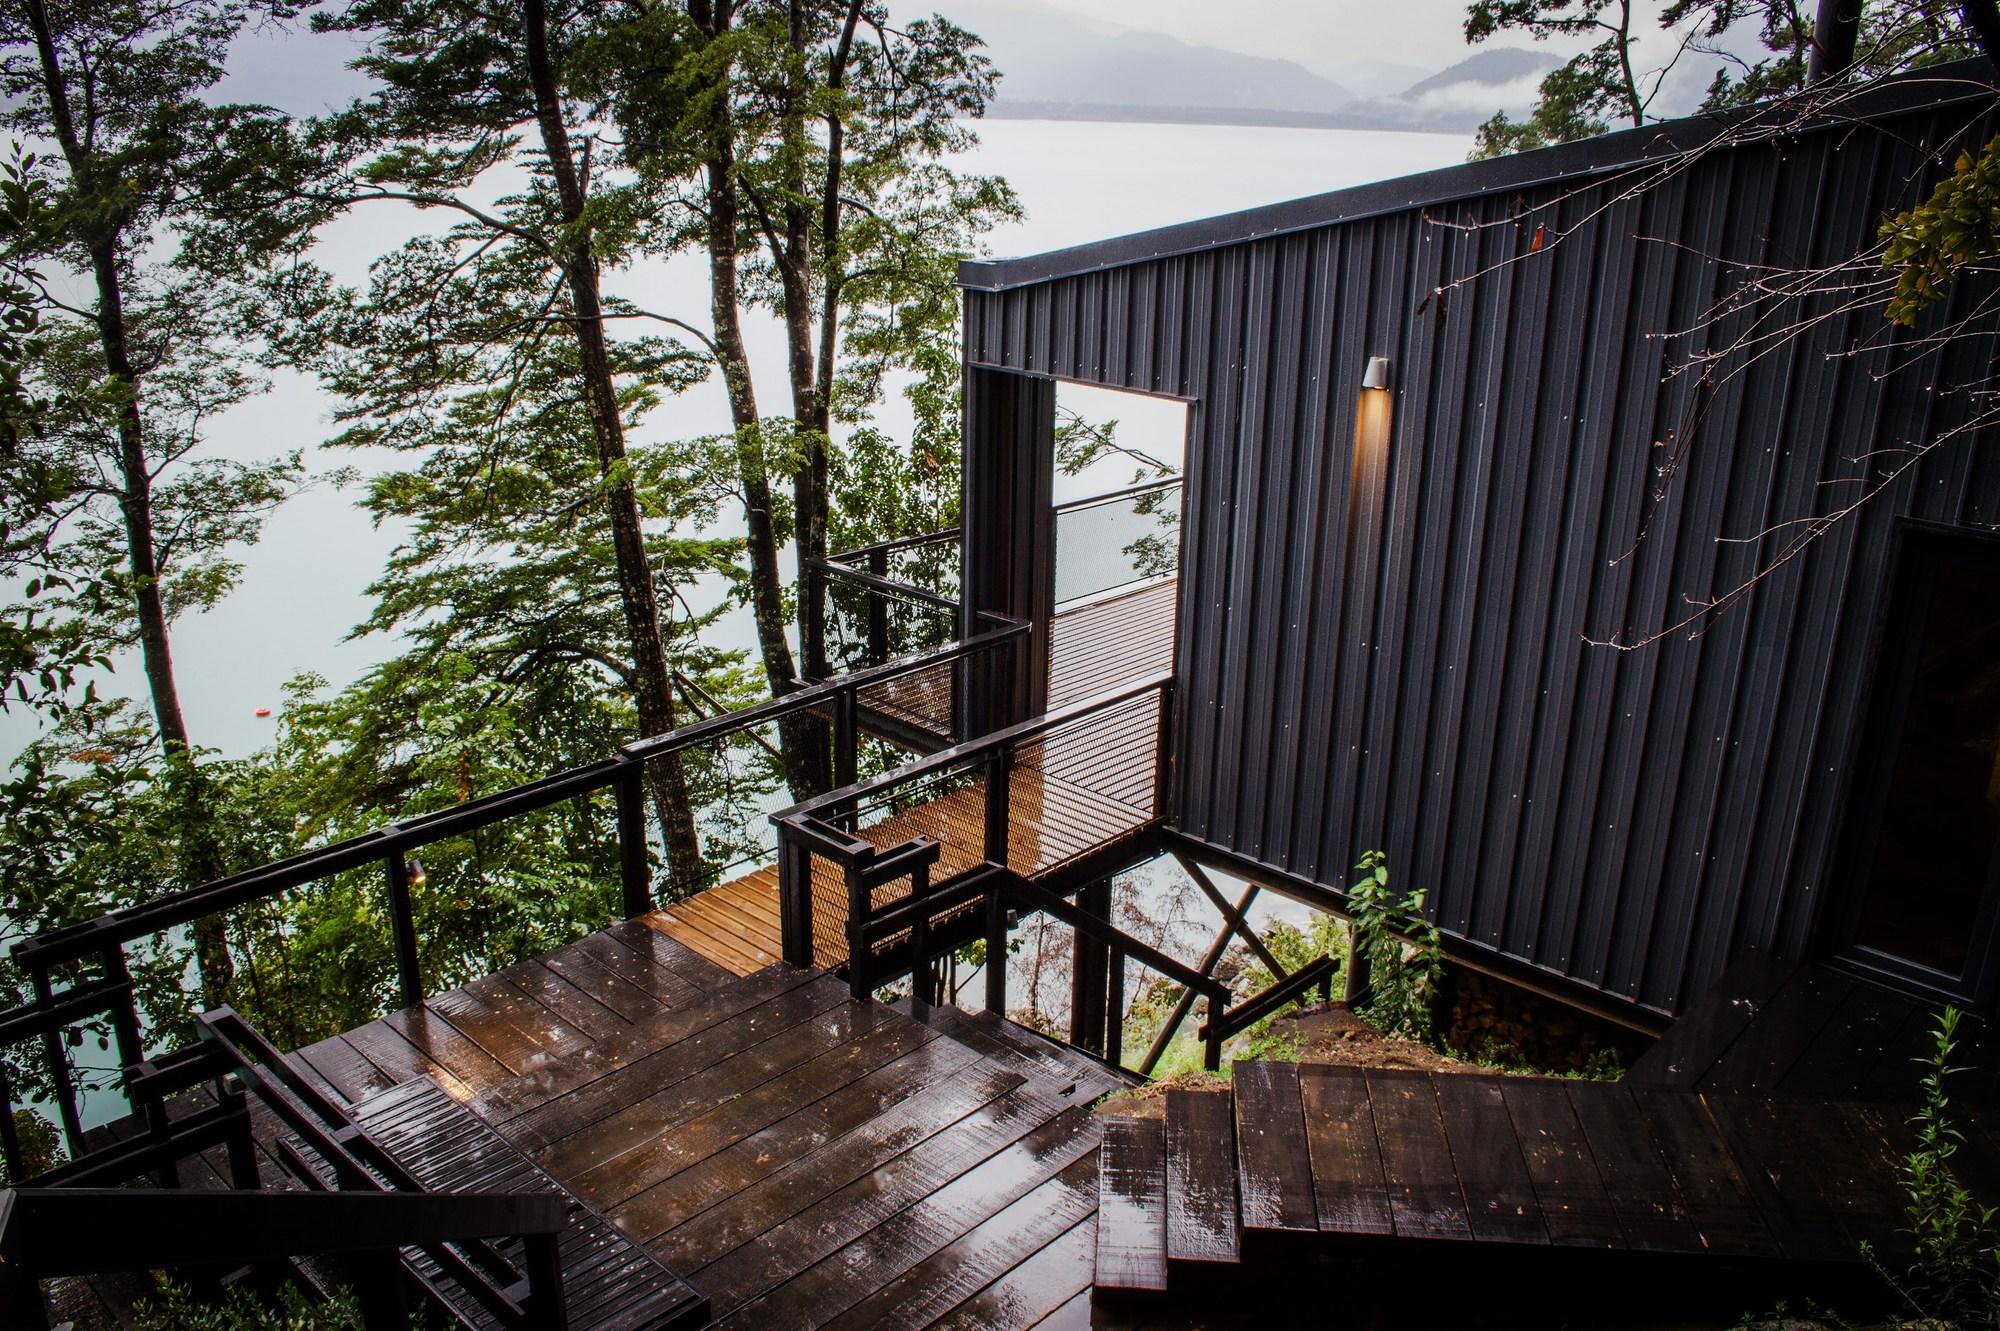 House on todos los santos lake apio arquitectos archdaily - Casas de arquitectos ...